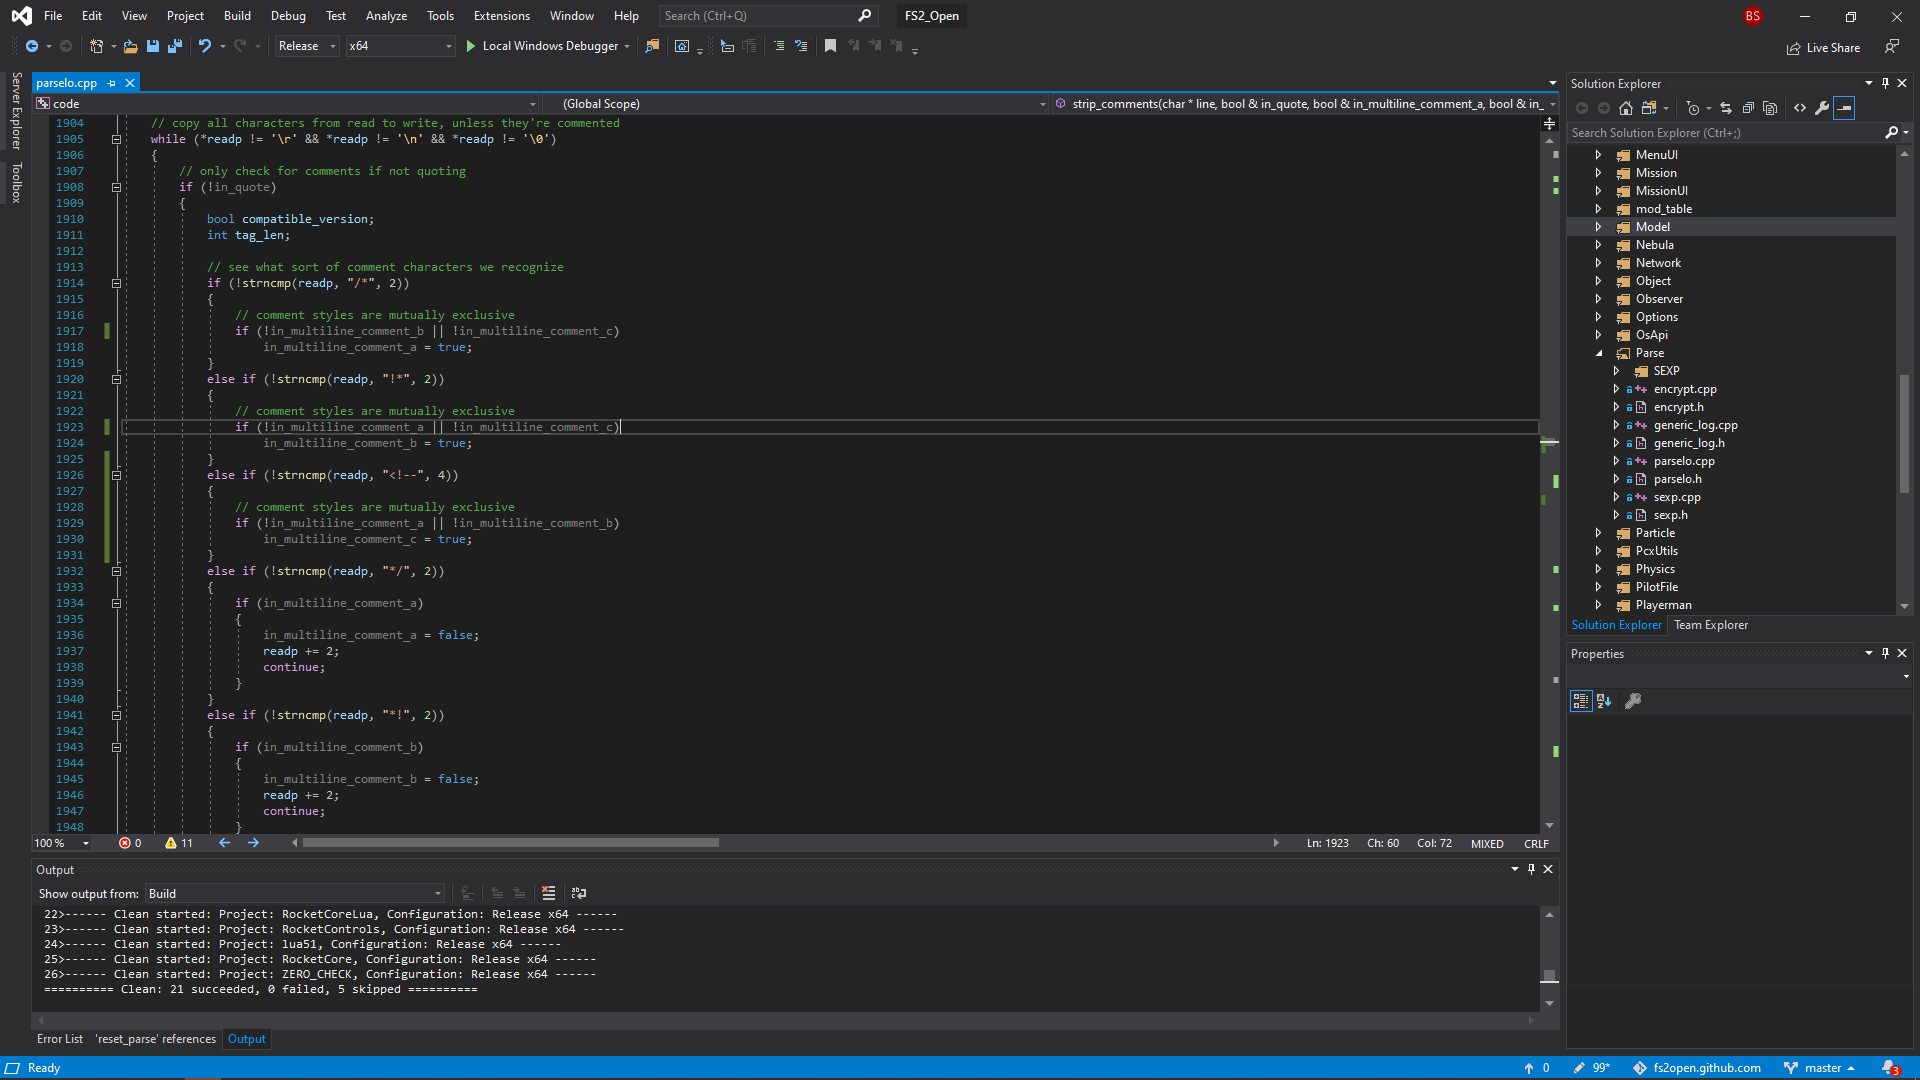 Rekt Galaxies/Fractured Suns dedicated build programming shot